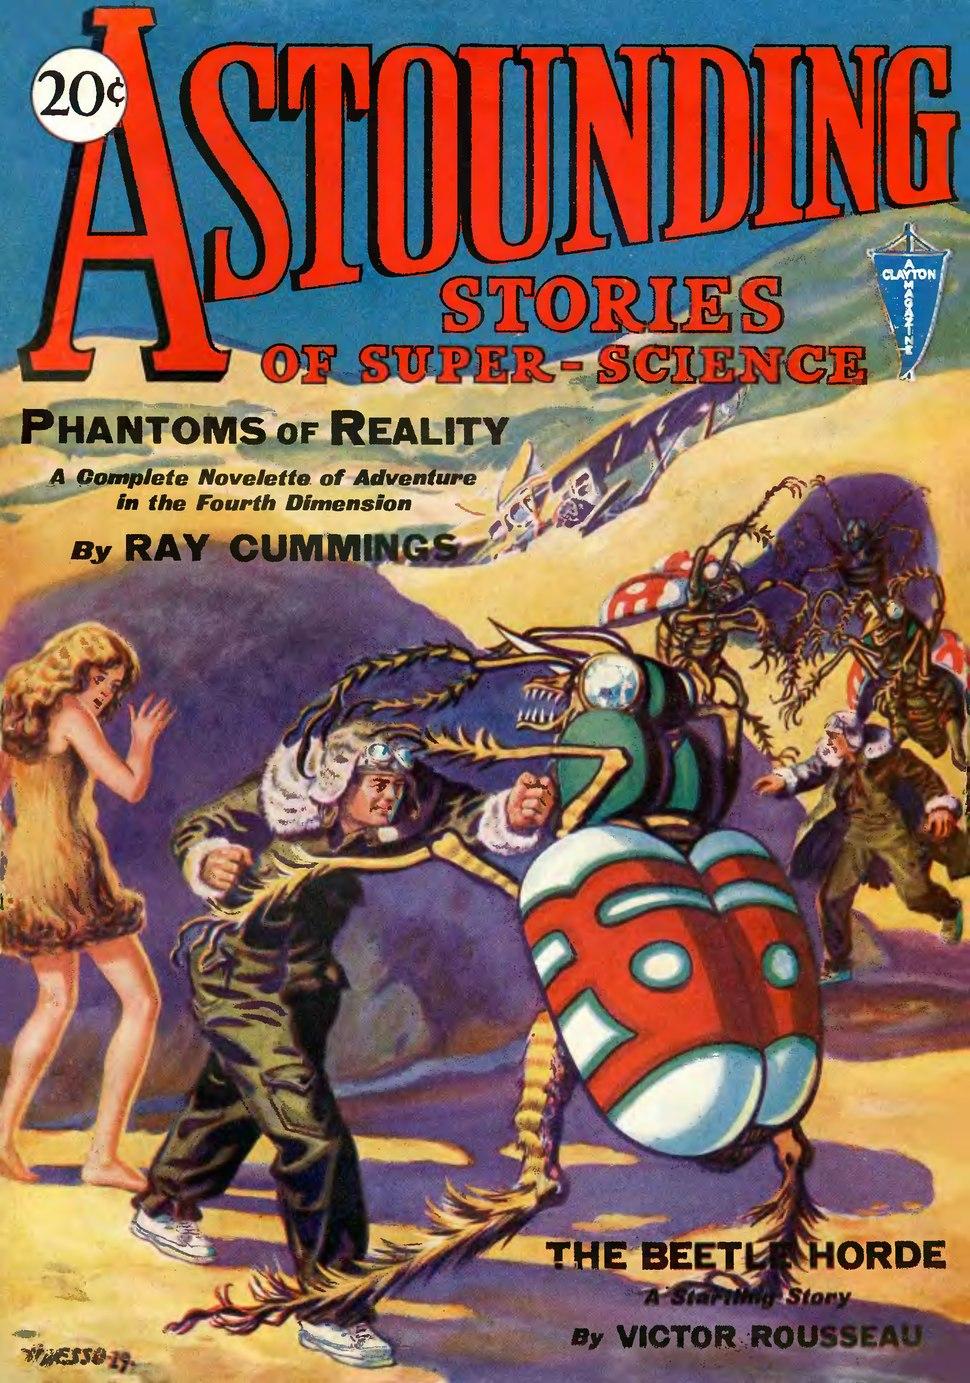 Astounding Stories of Super Science (1930-01).djvu